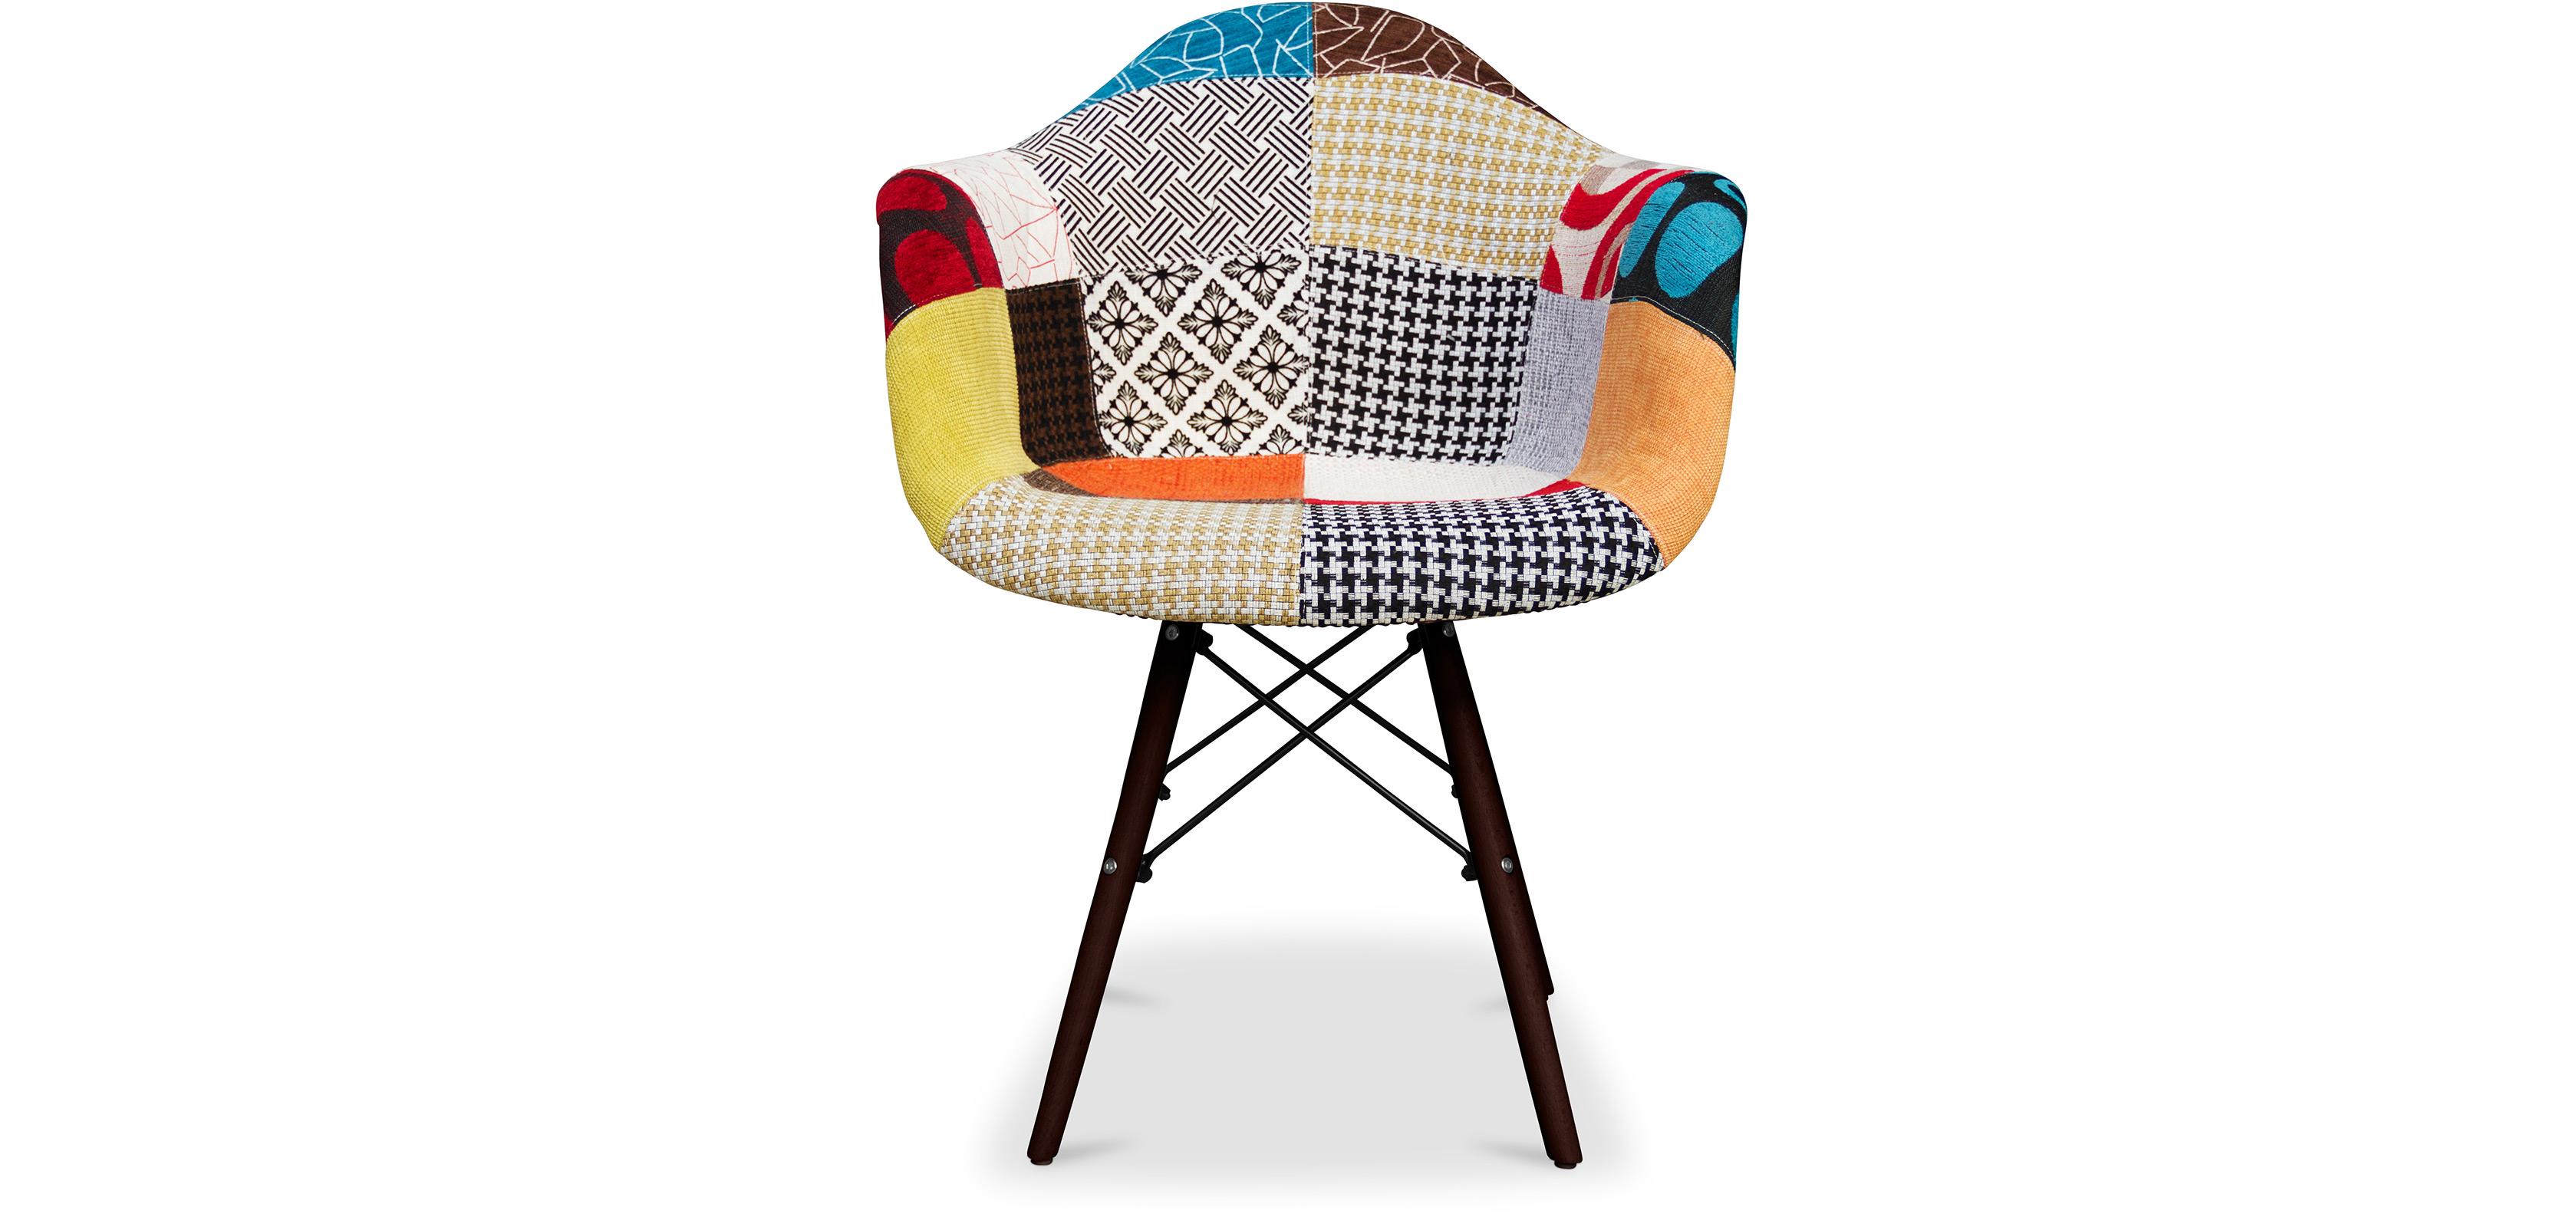 daw stuhl charles eames style. Black Bedroom Furniture Sets. Home Design Ideas